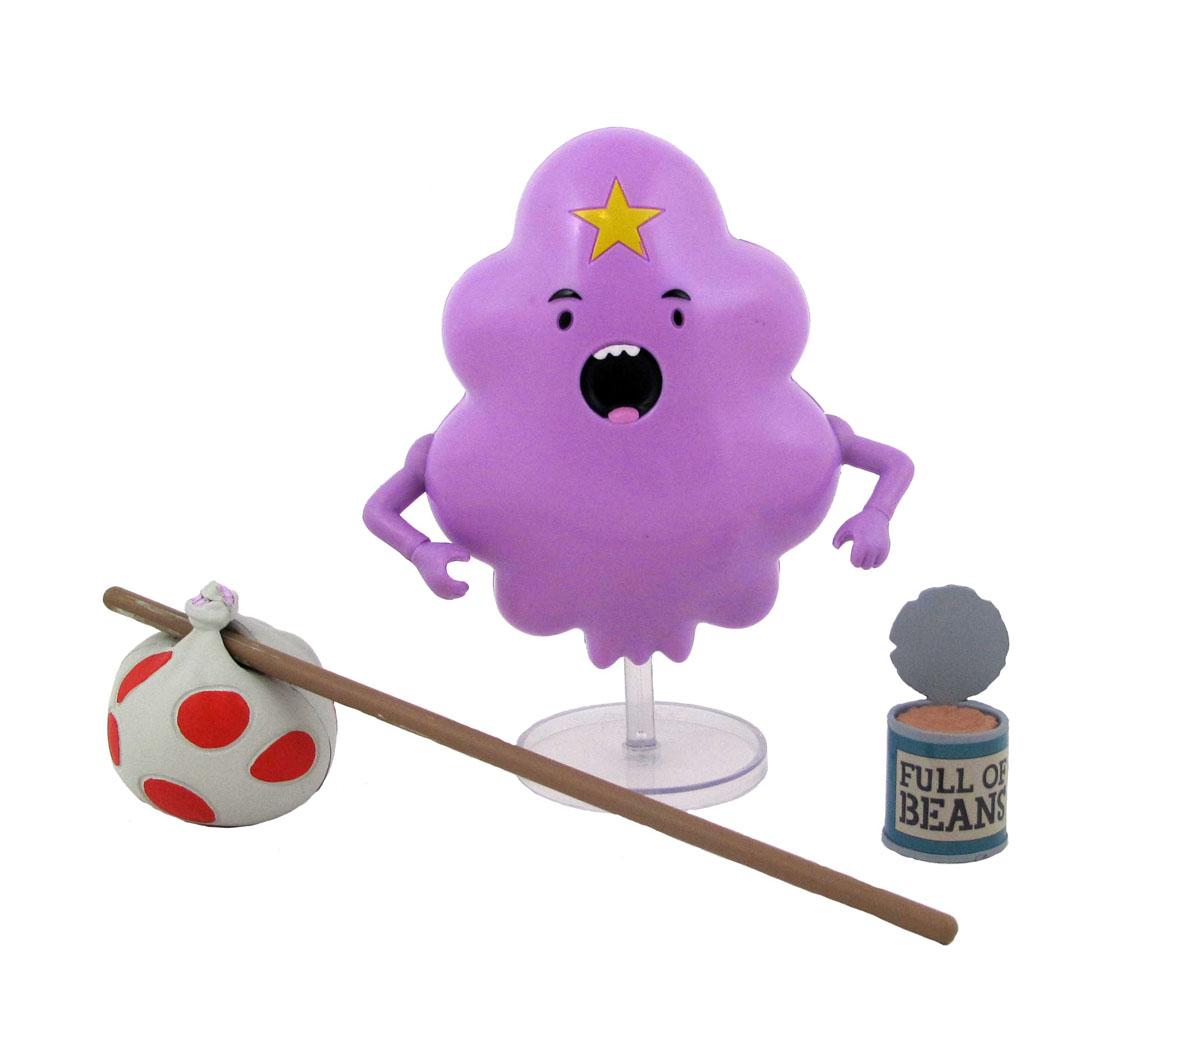 Фигурка Adventure Time Принцесса Пупырка, с аксессуарами, 12 см фигурка scalers adventure time finn 5 см